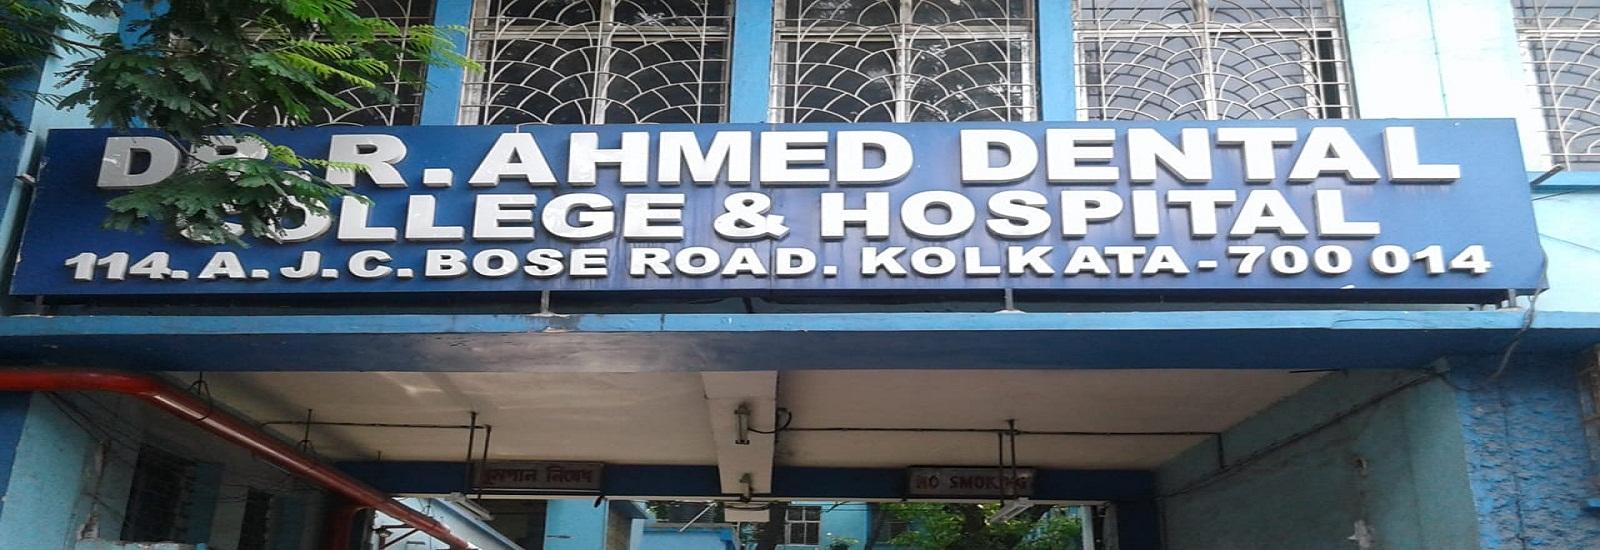 Dr. R. Ahmed Dental College and Hospital, Kolkata Image